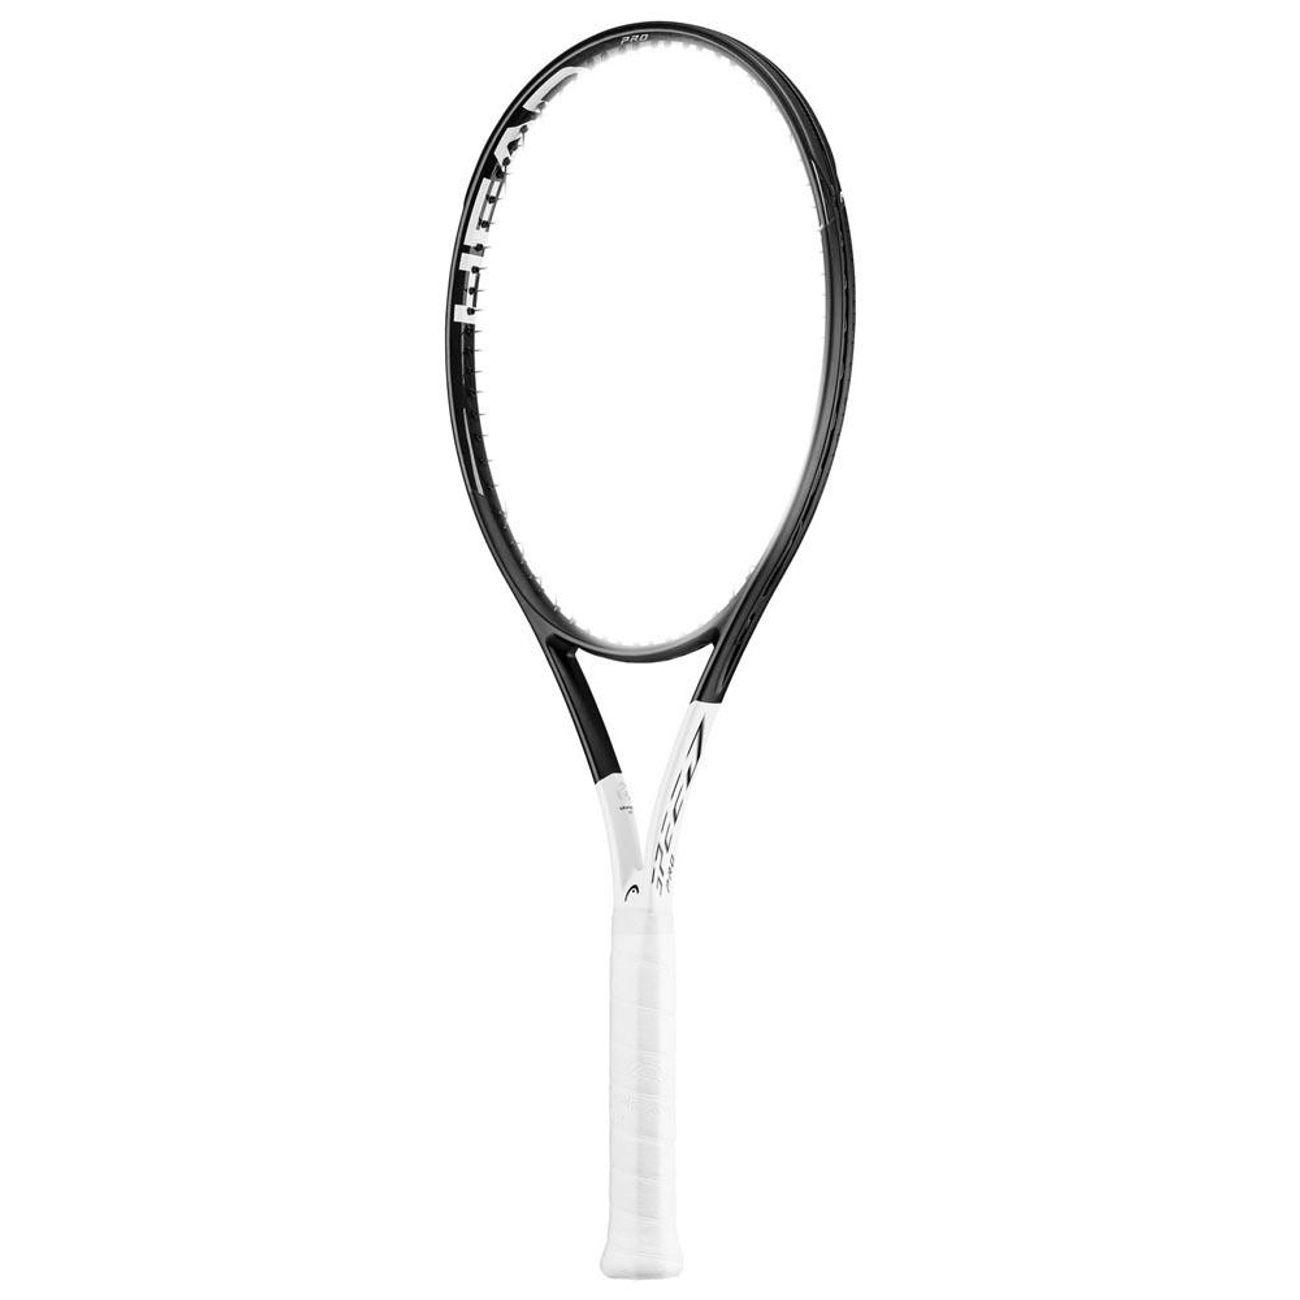 new concept 48780 25630 Tennis HEAD Head Graphene 360 Speed Pro Unstrung ...